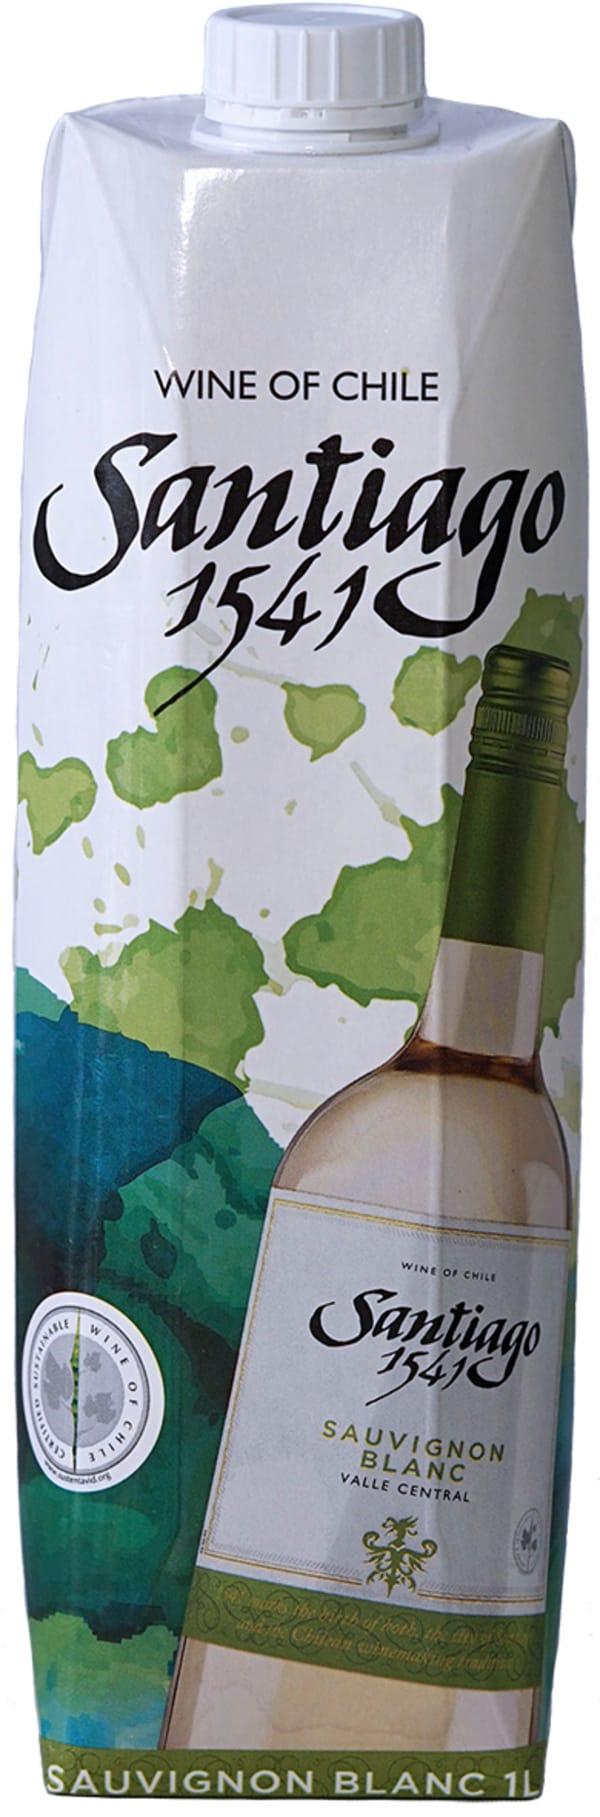 Santiago 1541 Sauvignon Blanc 2018 kartongförpackning